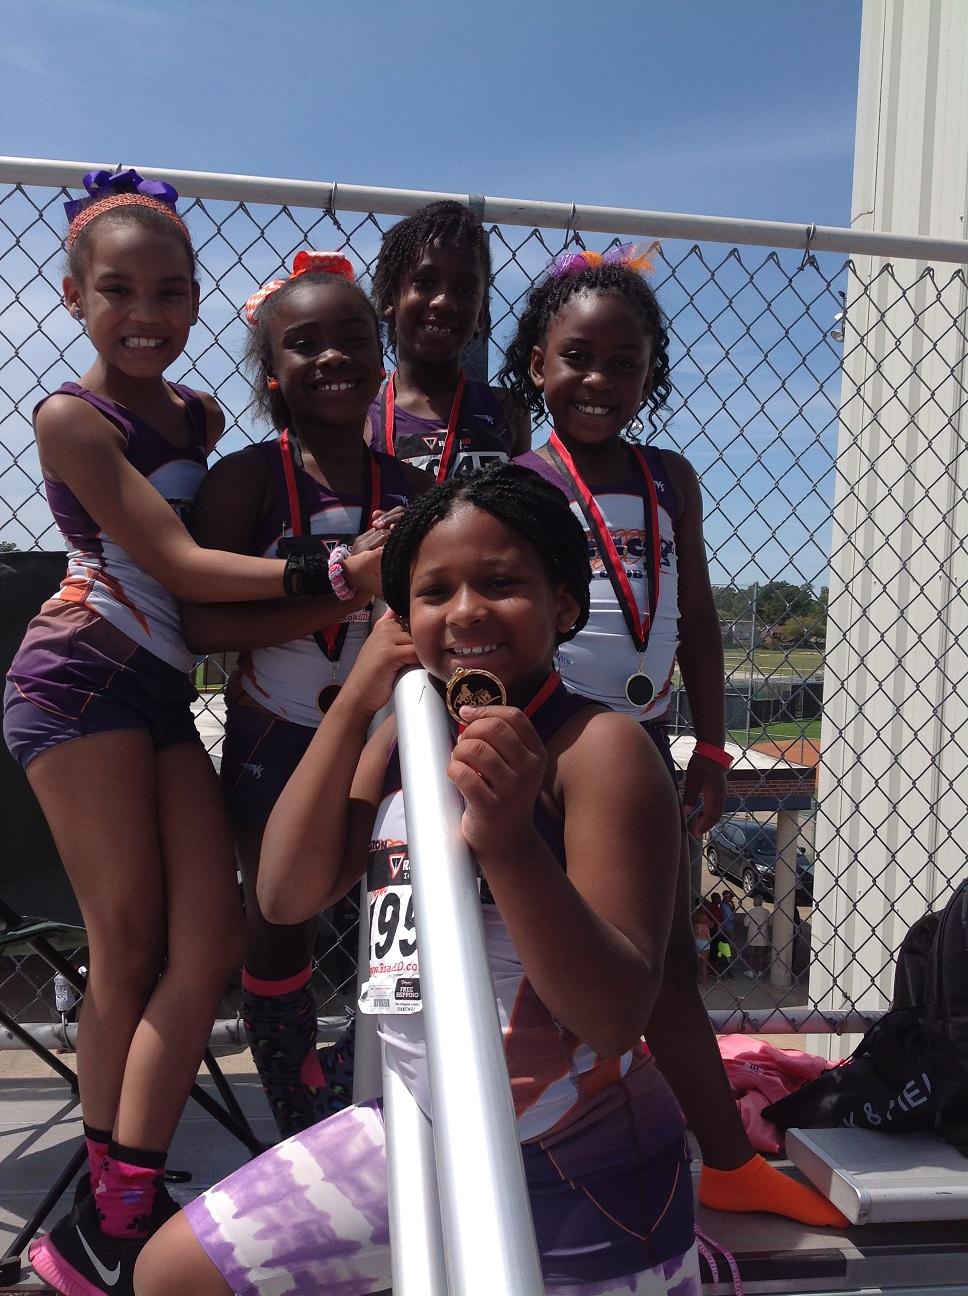 Primary Girls 4x100 relay